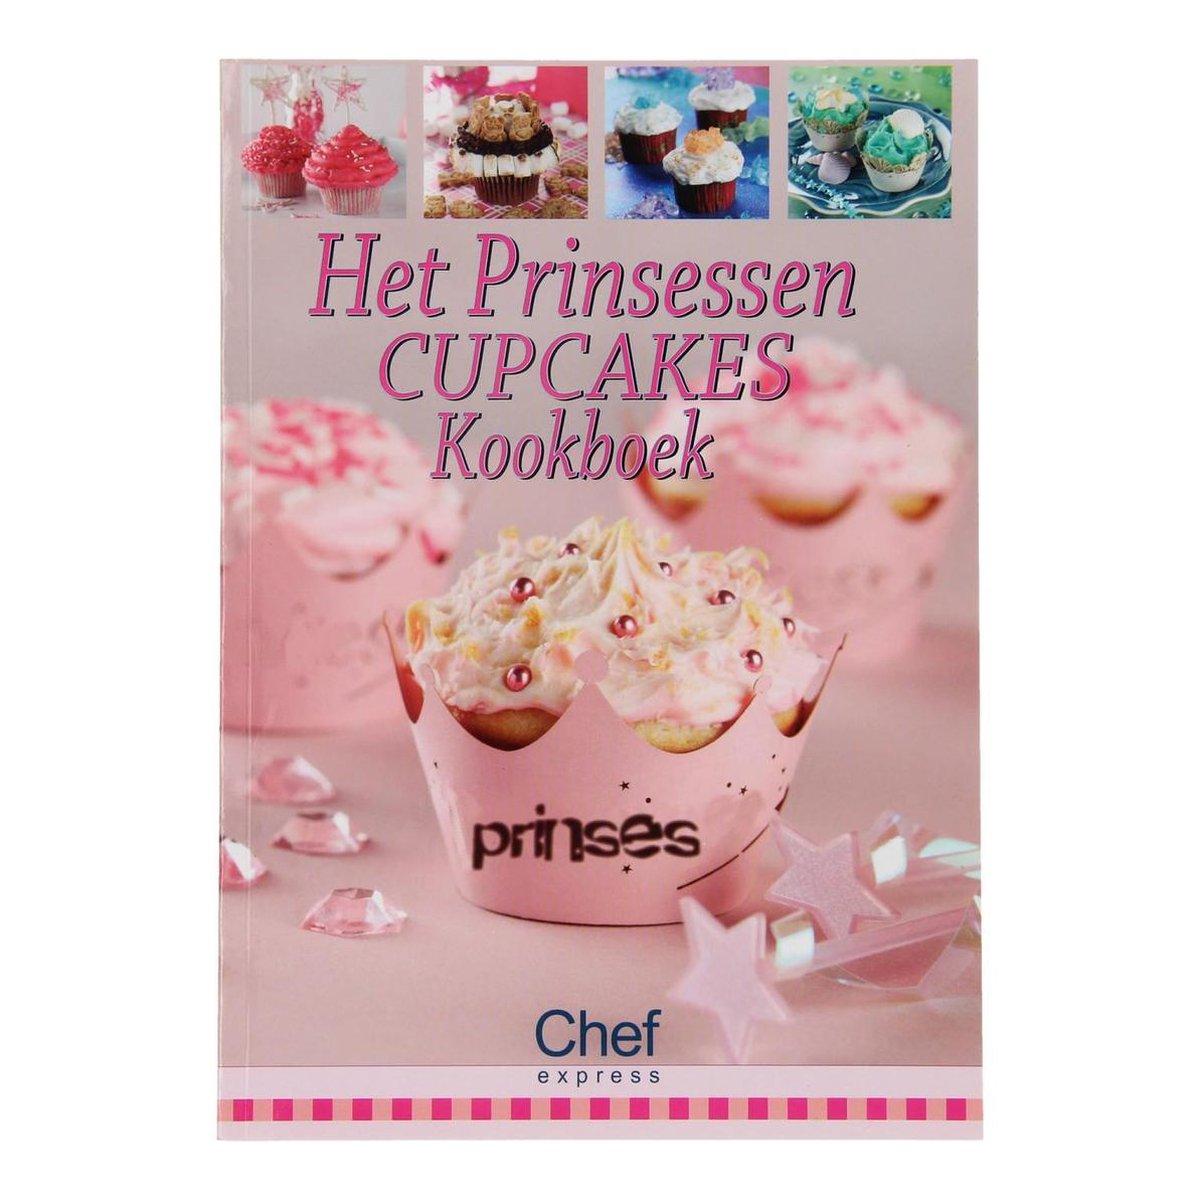 Het prinsessen cupcake kookboek